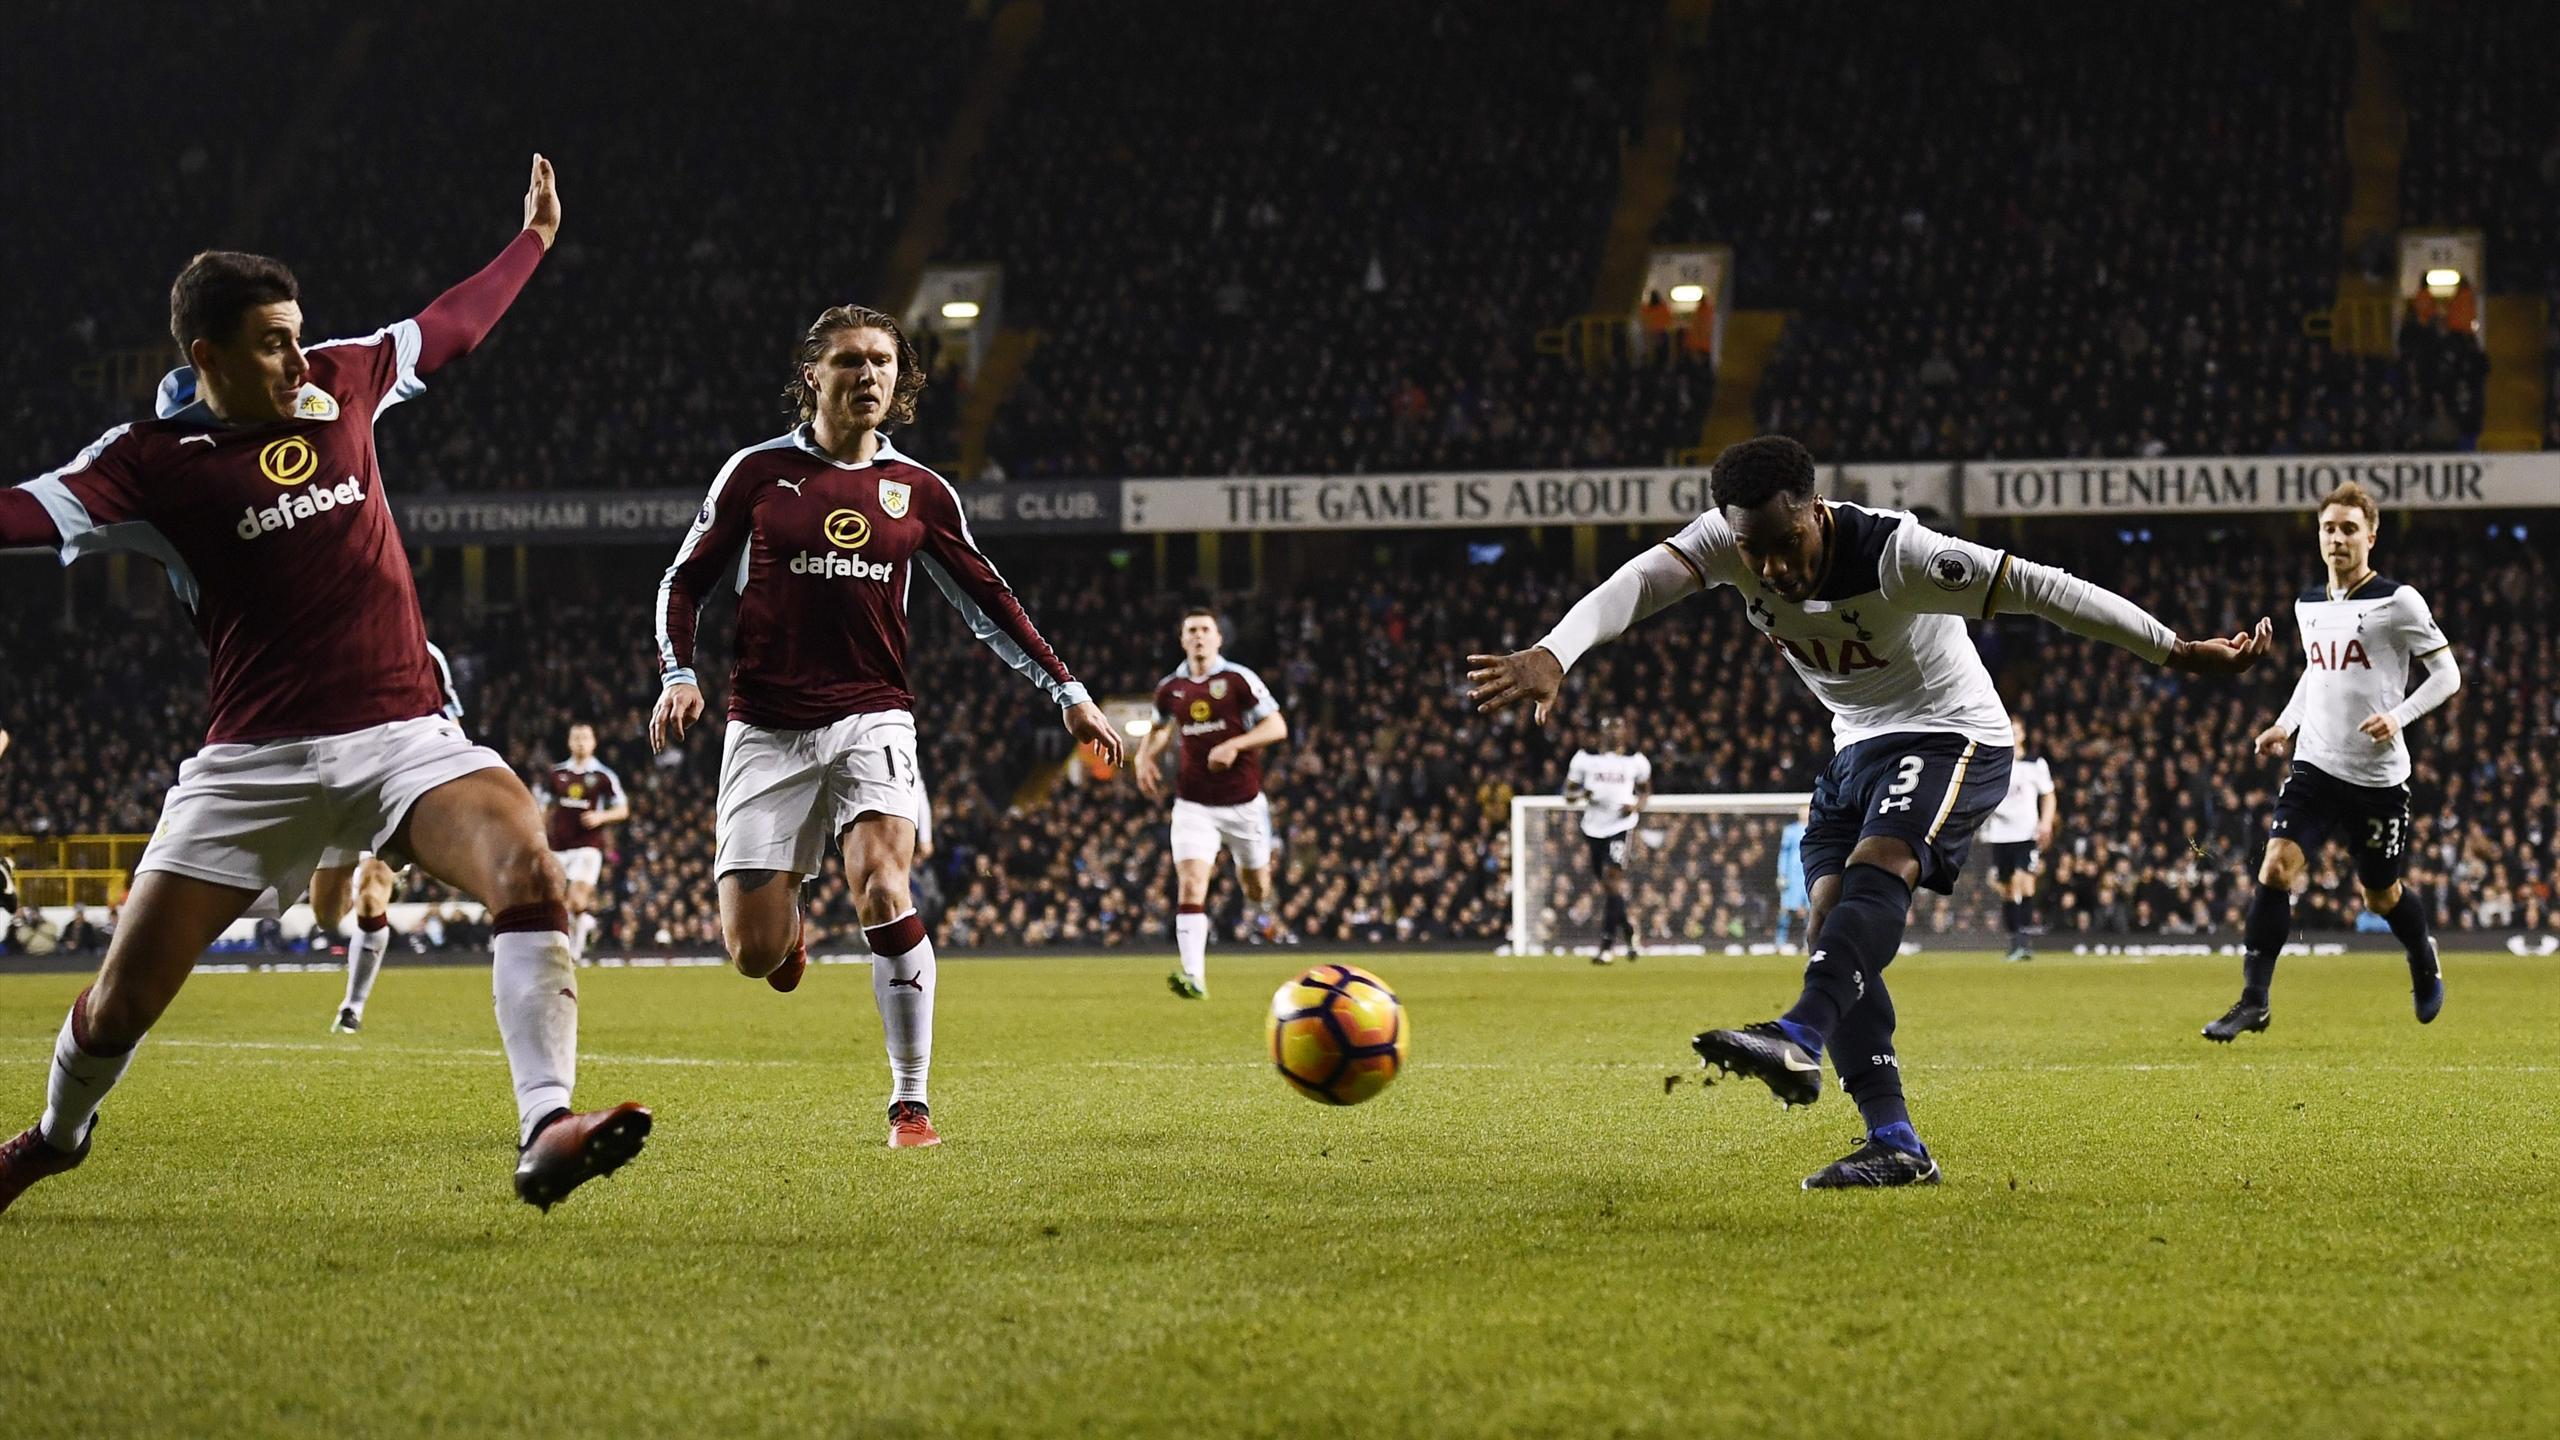 Tottenham's Danny Rose scores their second goal